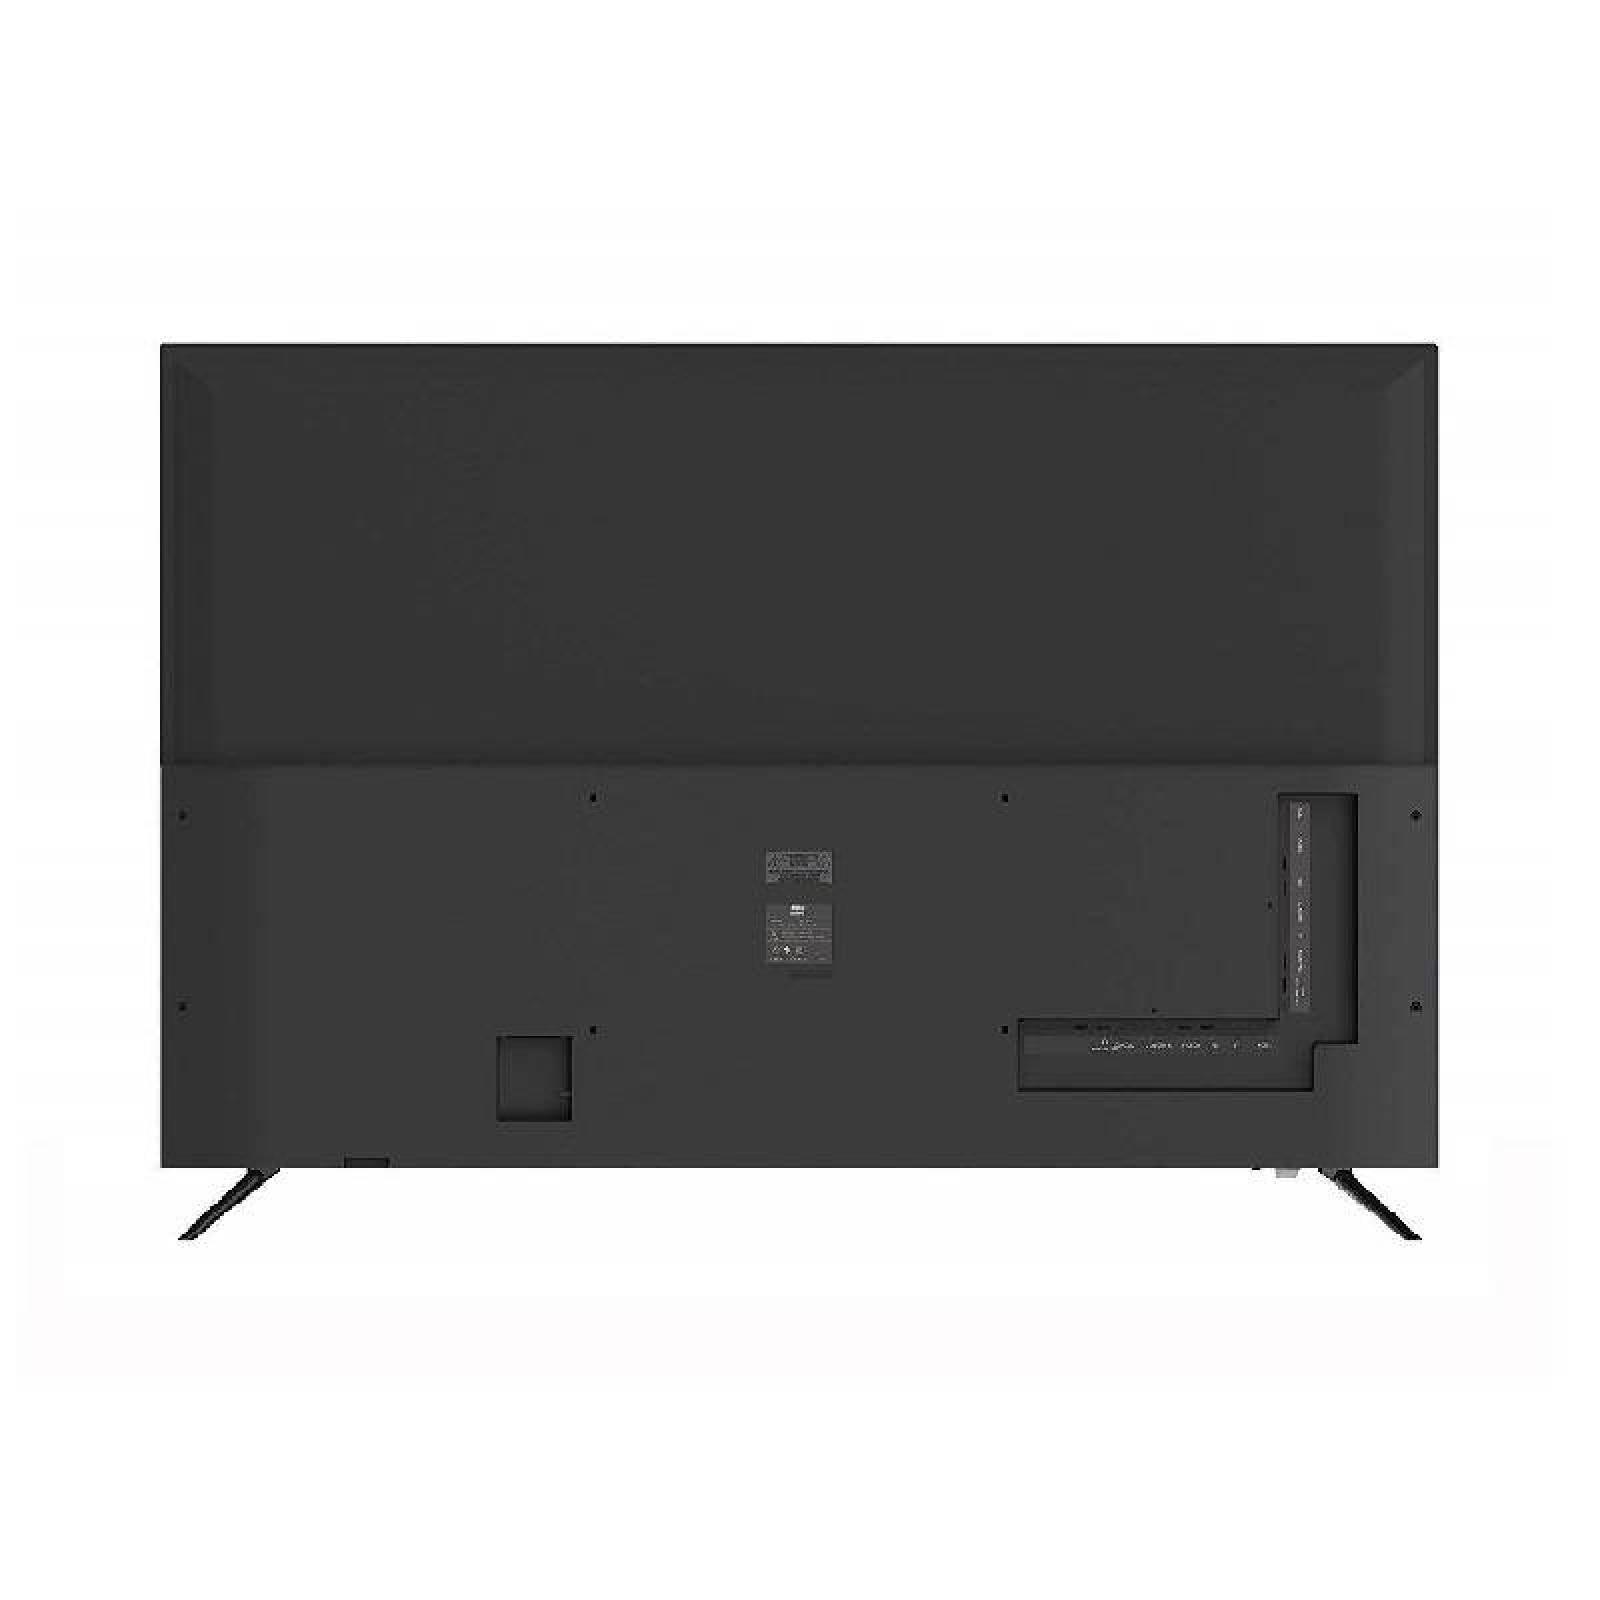 "Smart TV Makena 50"" 4K UHD"